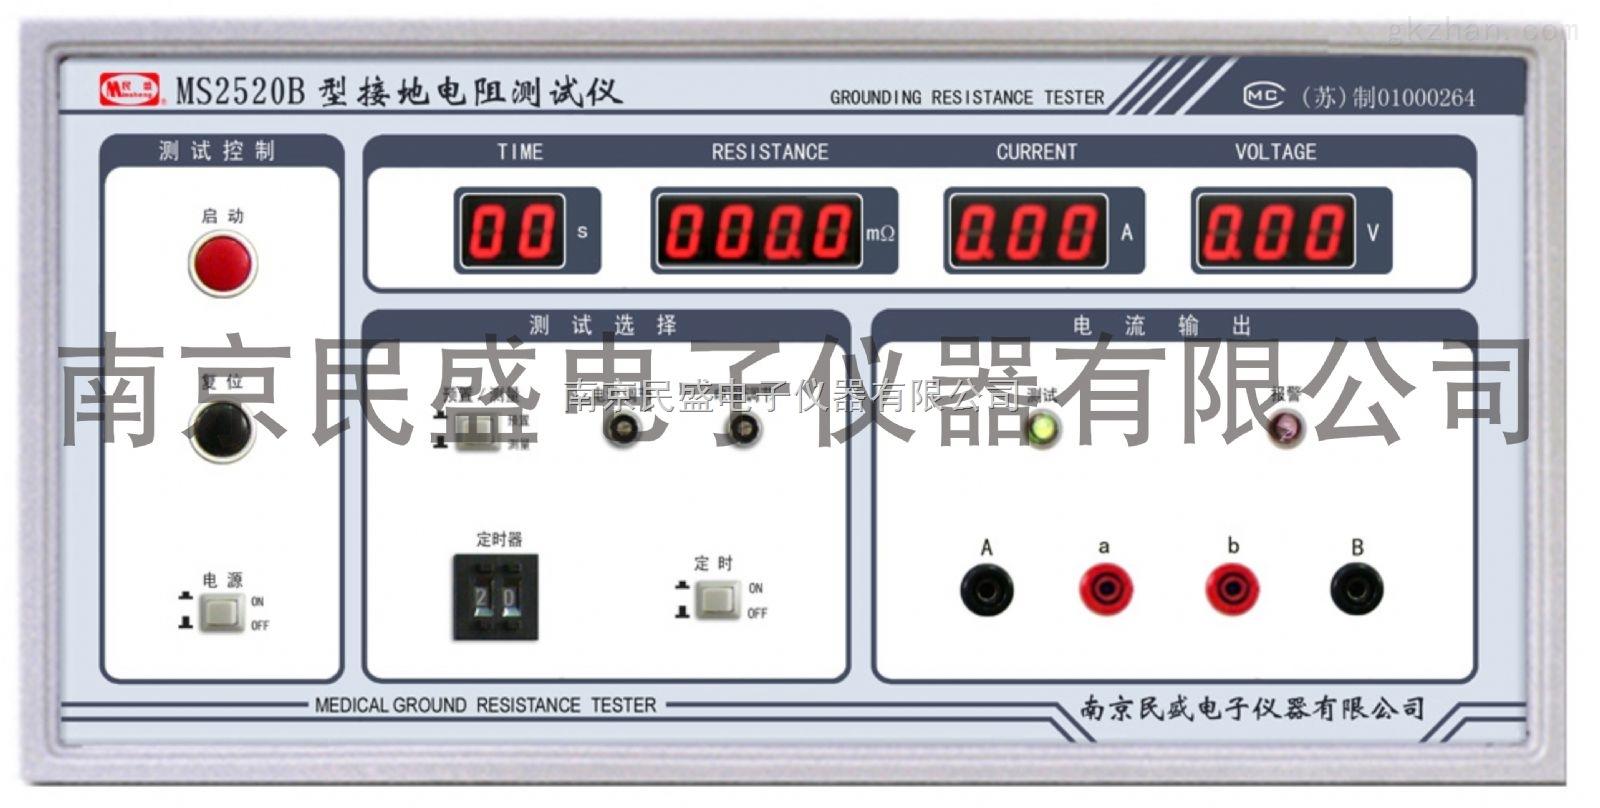 ms2520b 接地电阻测试仪